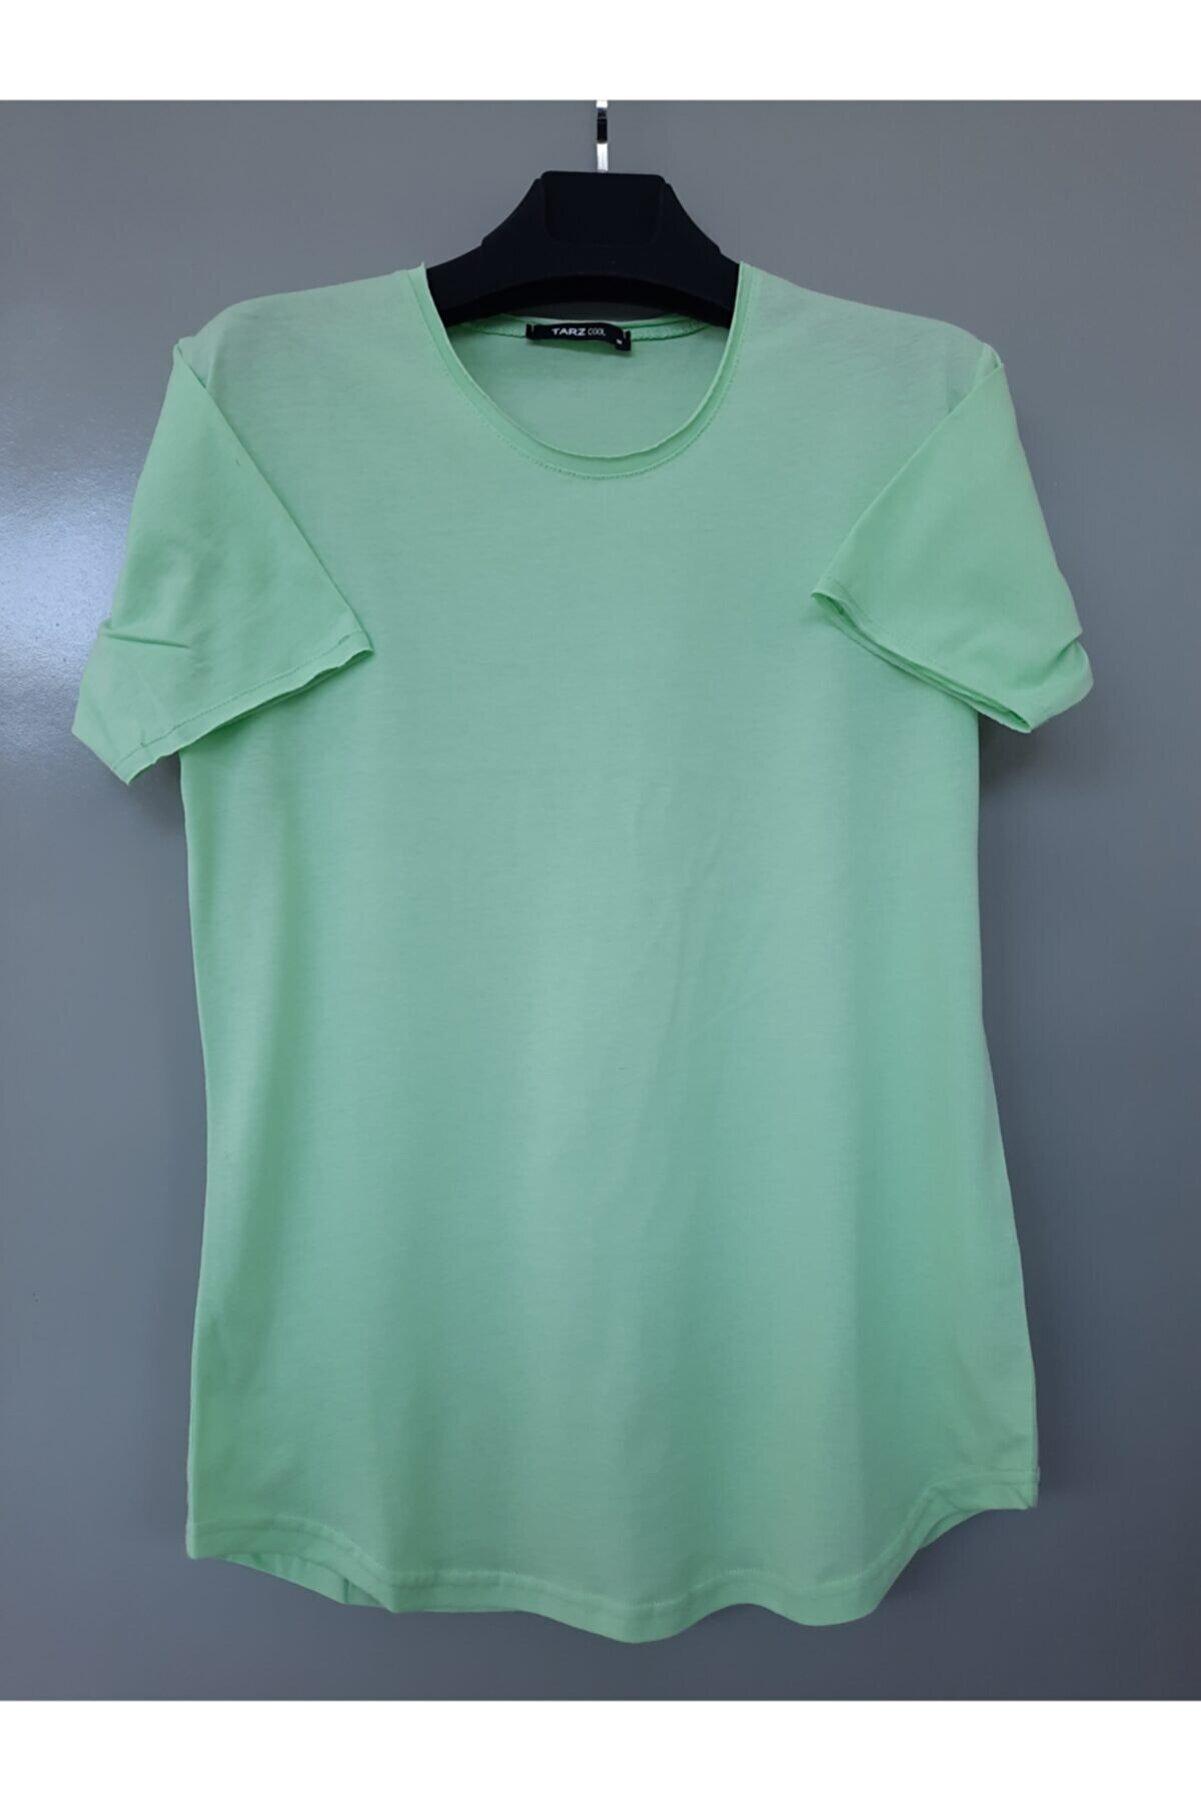 Tarz Cool Erkek Koyu Cool Yeşili Pis Yaka Salaş T-shirt